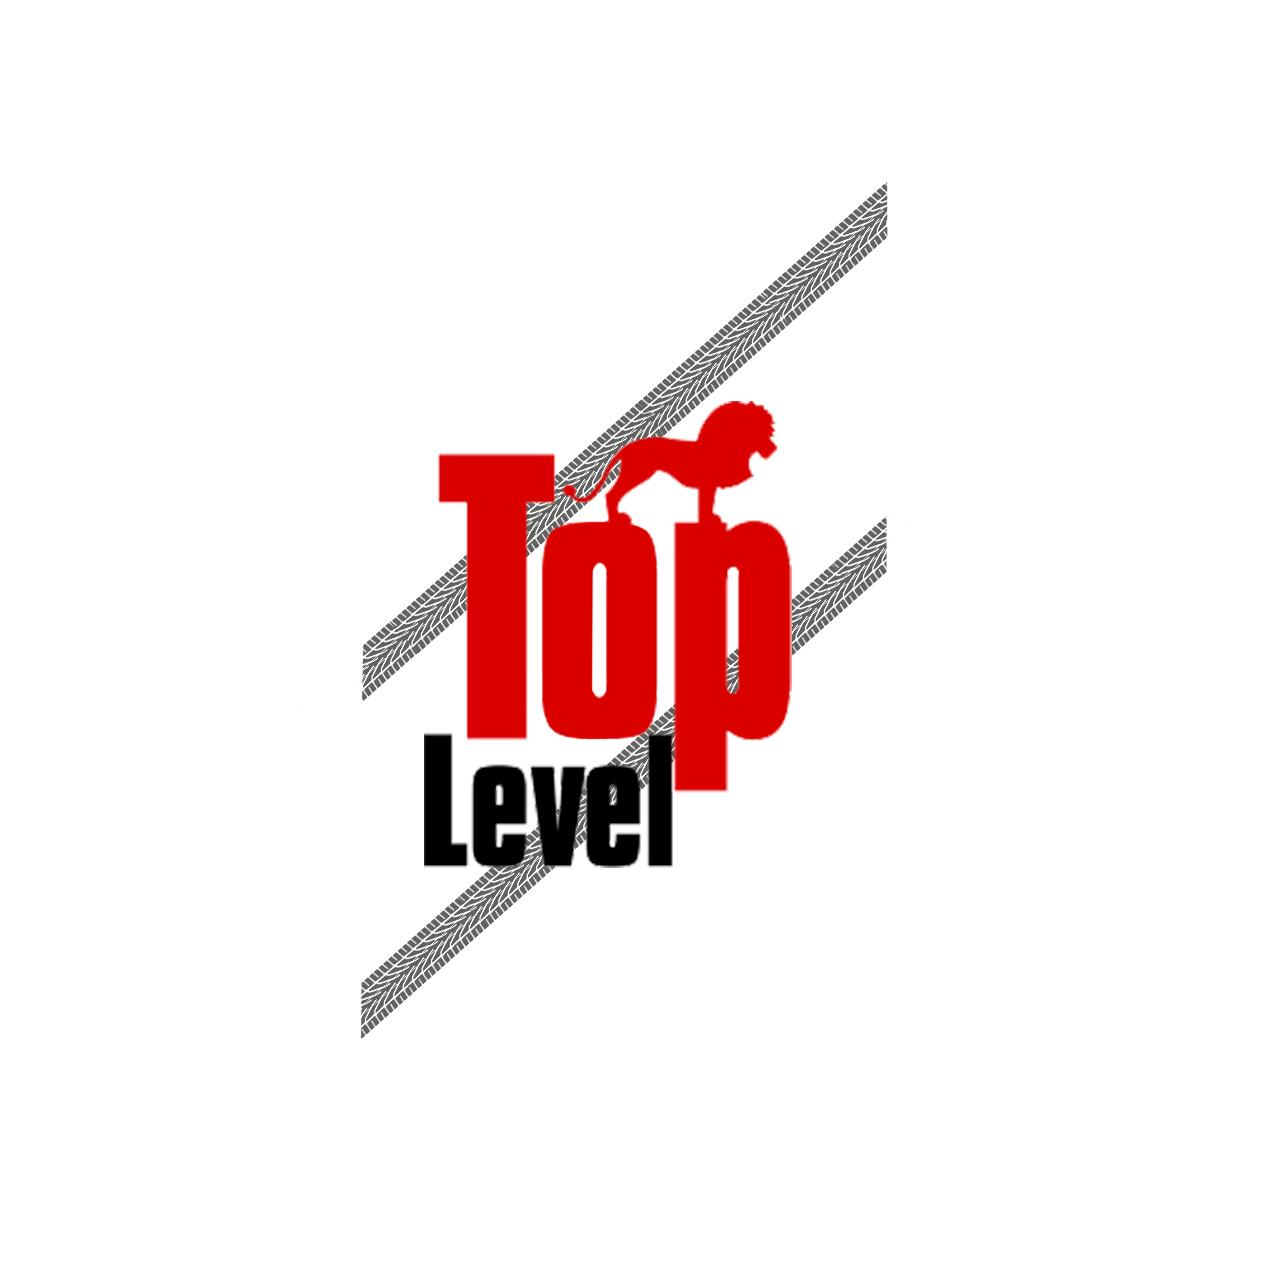 Разработка логотипа для тюнинг ателье фото f_8785f3166a259561.png